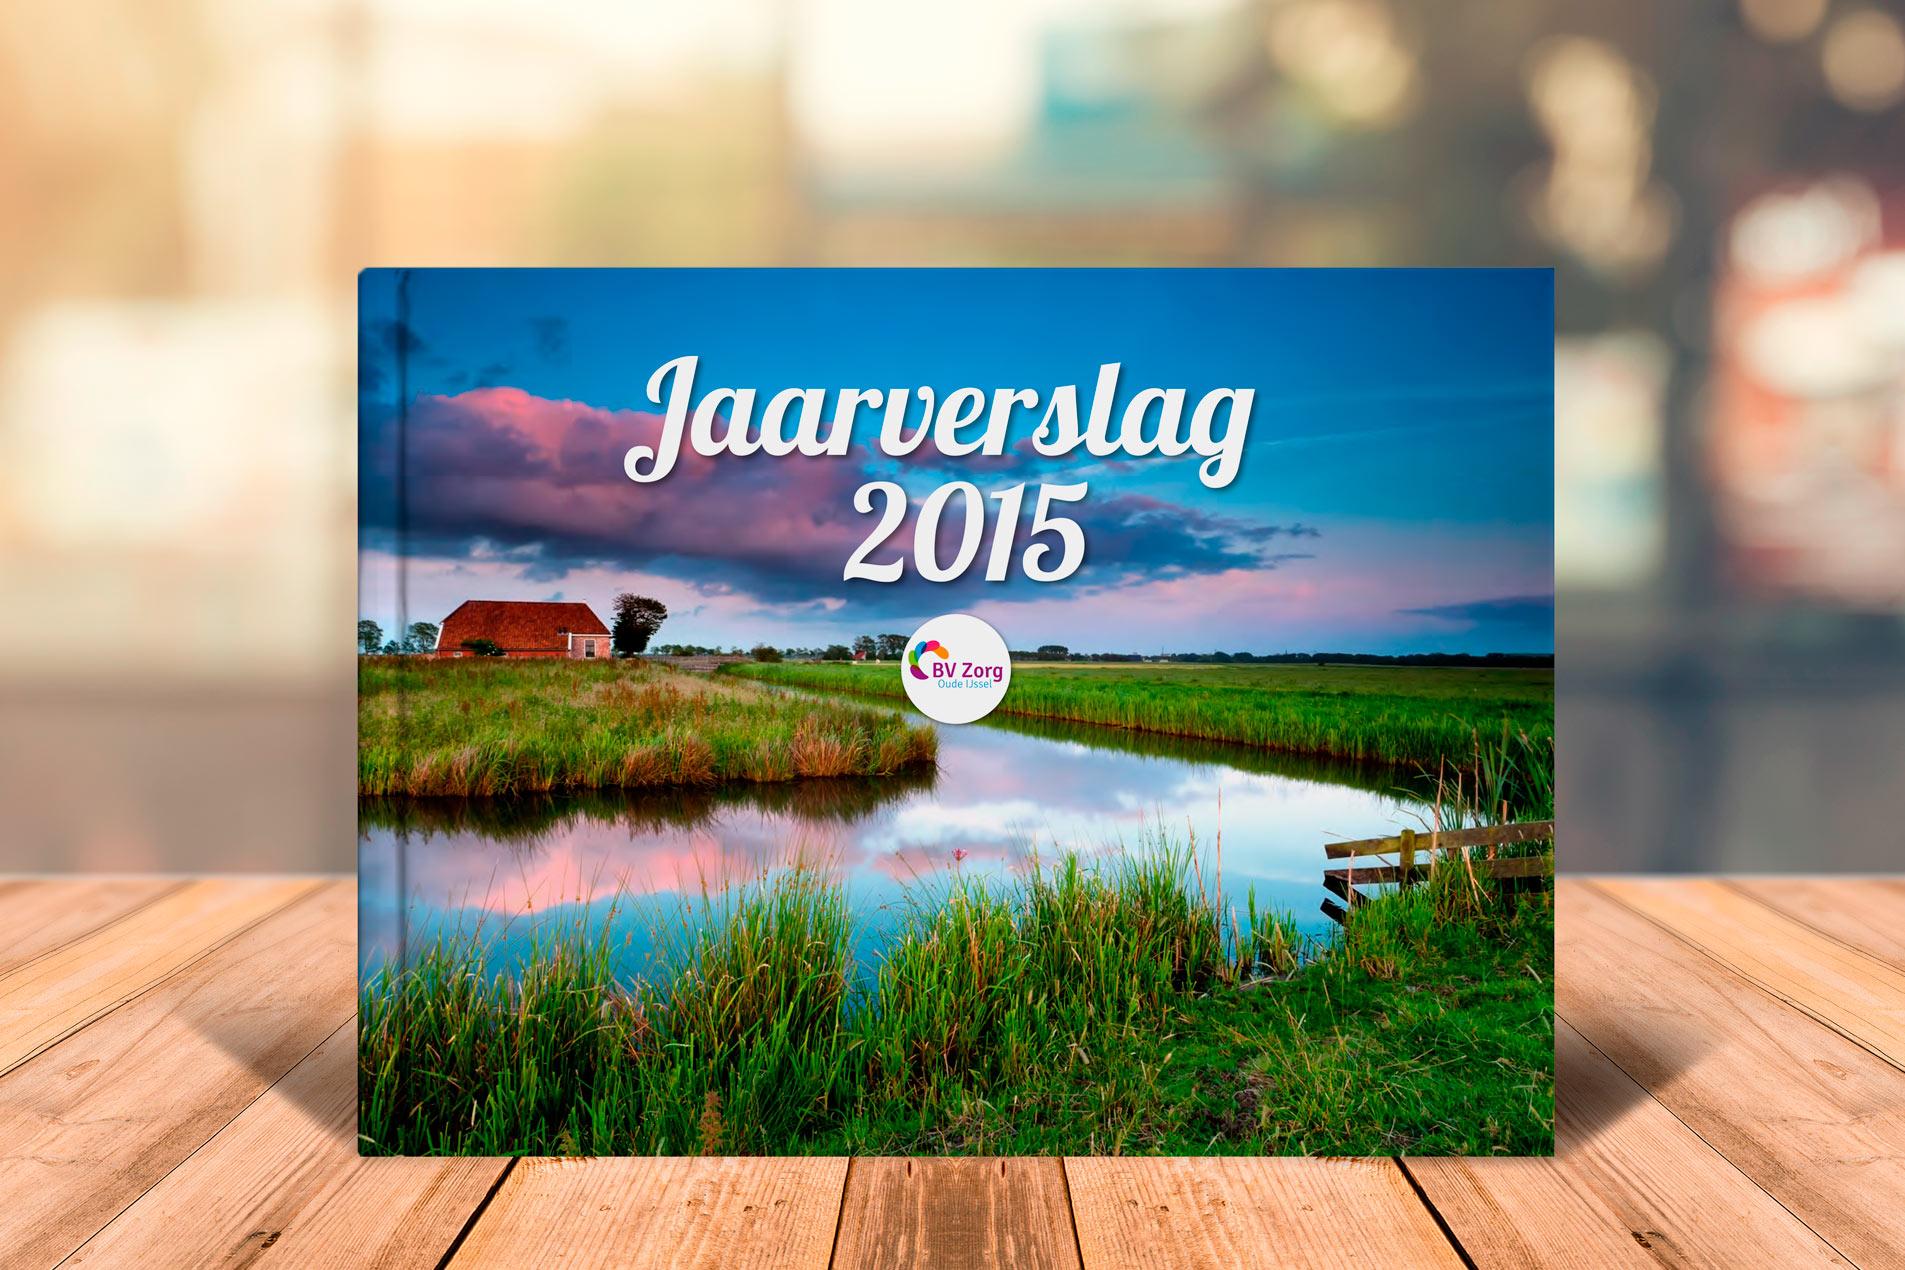 BV Zorg Oude IJssijl Jaarverslag 2015